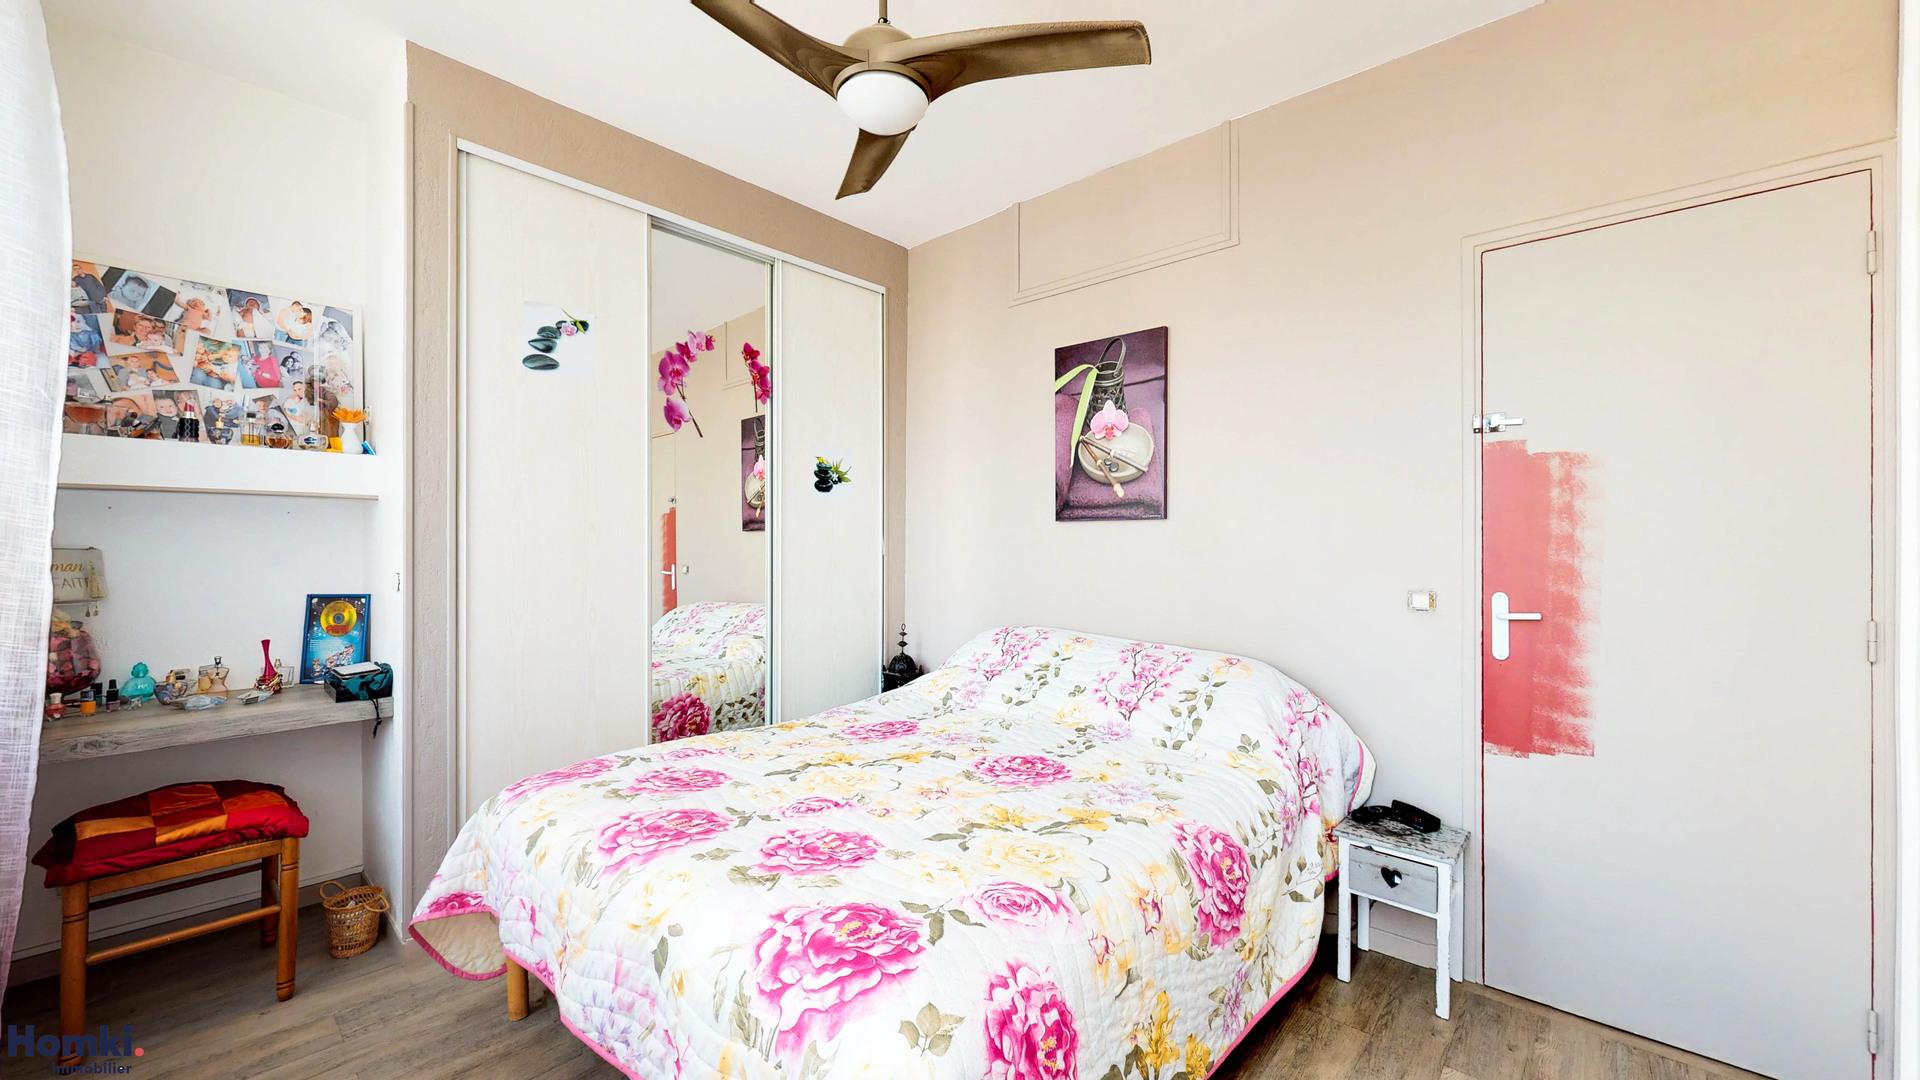 Vente Appartement 80 m² T4 13014 Marseille_4